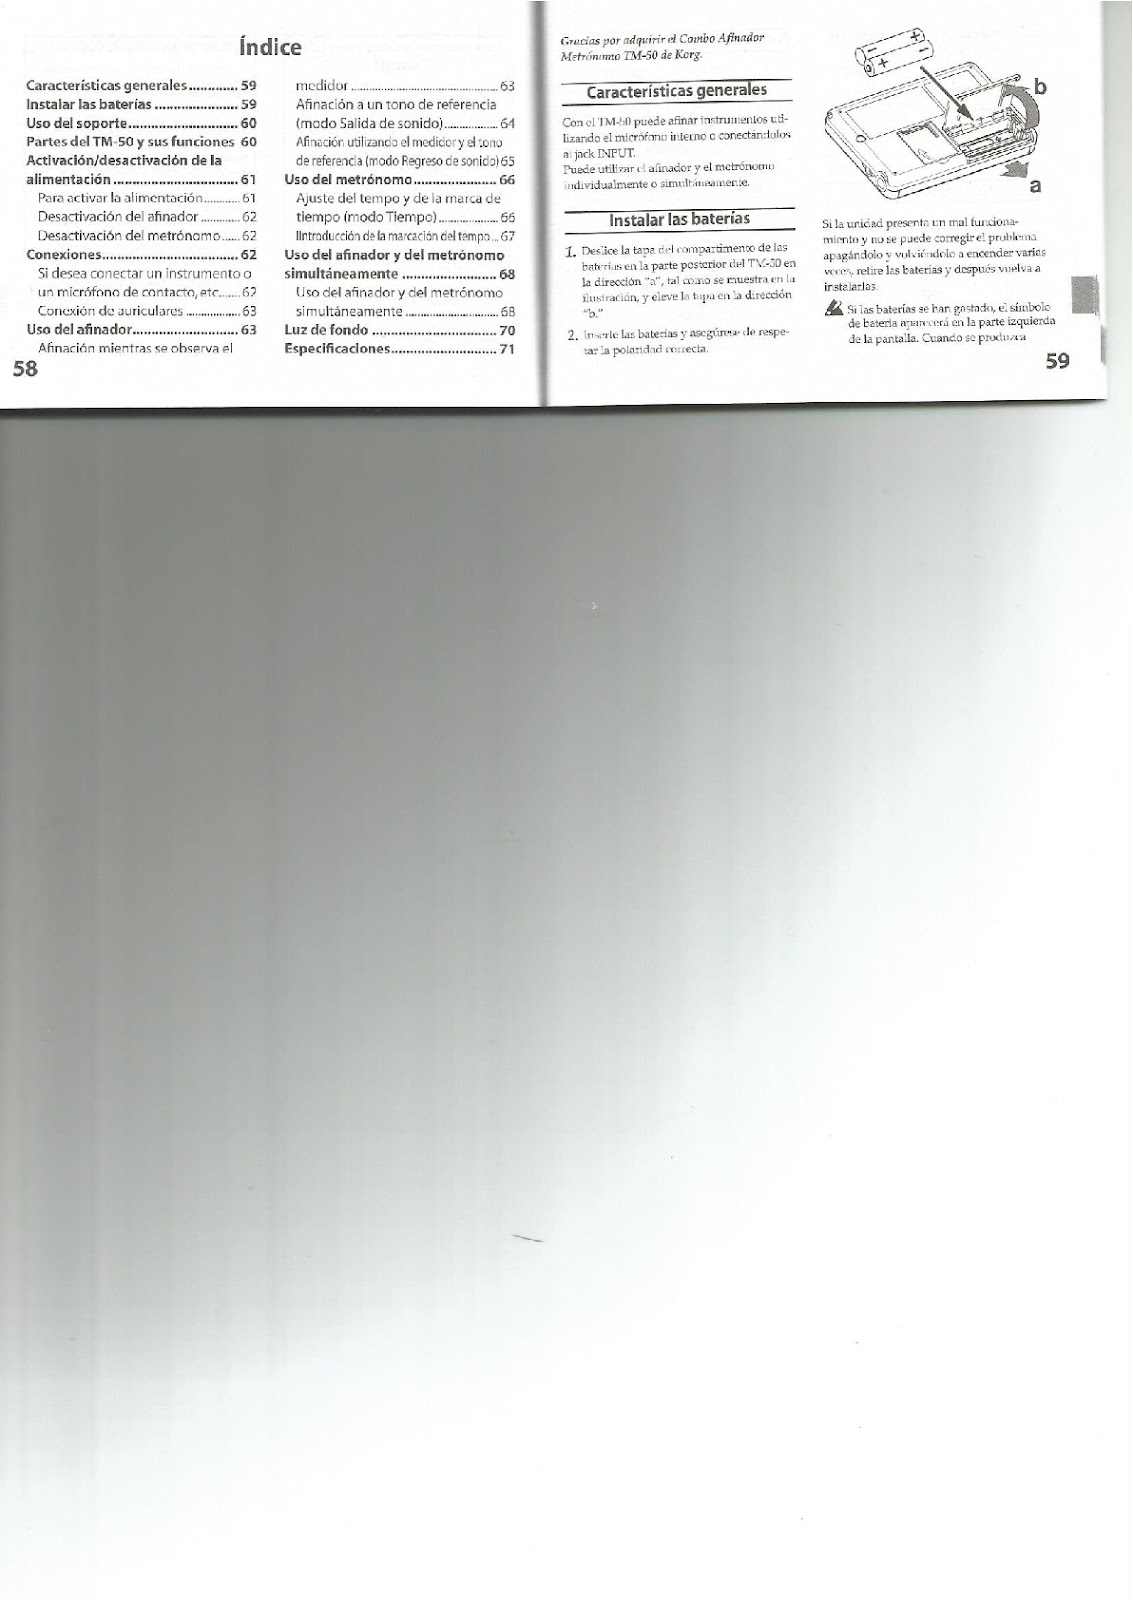 manuaisequiposPDF-020.jpg